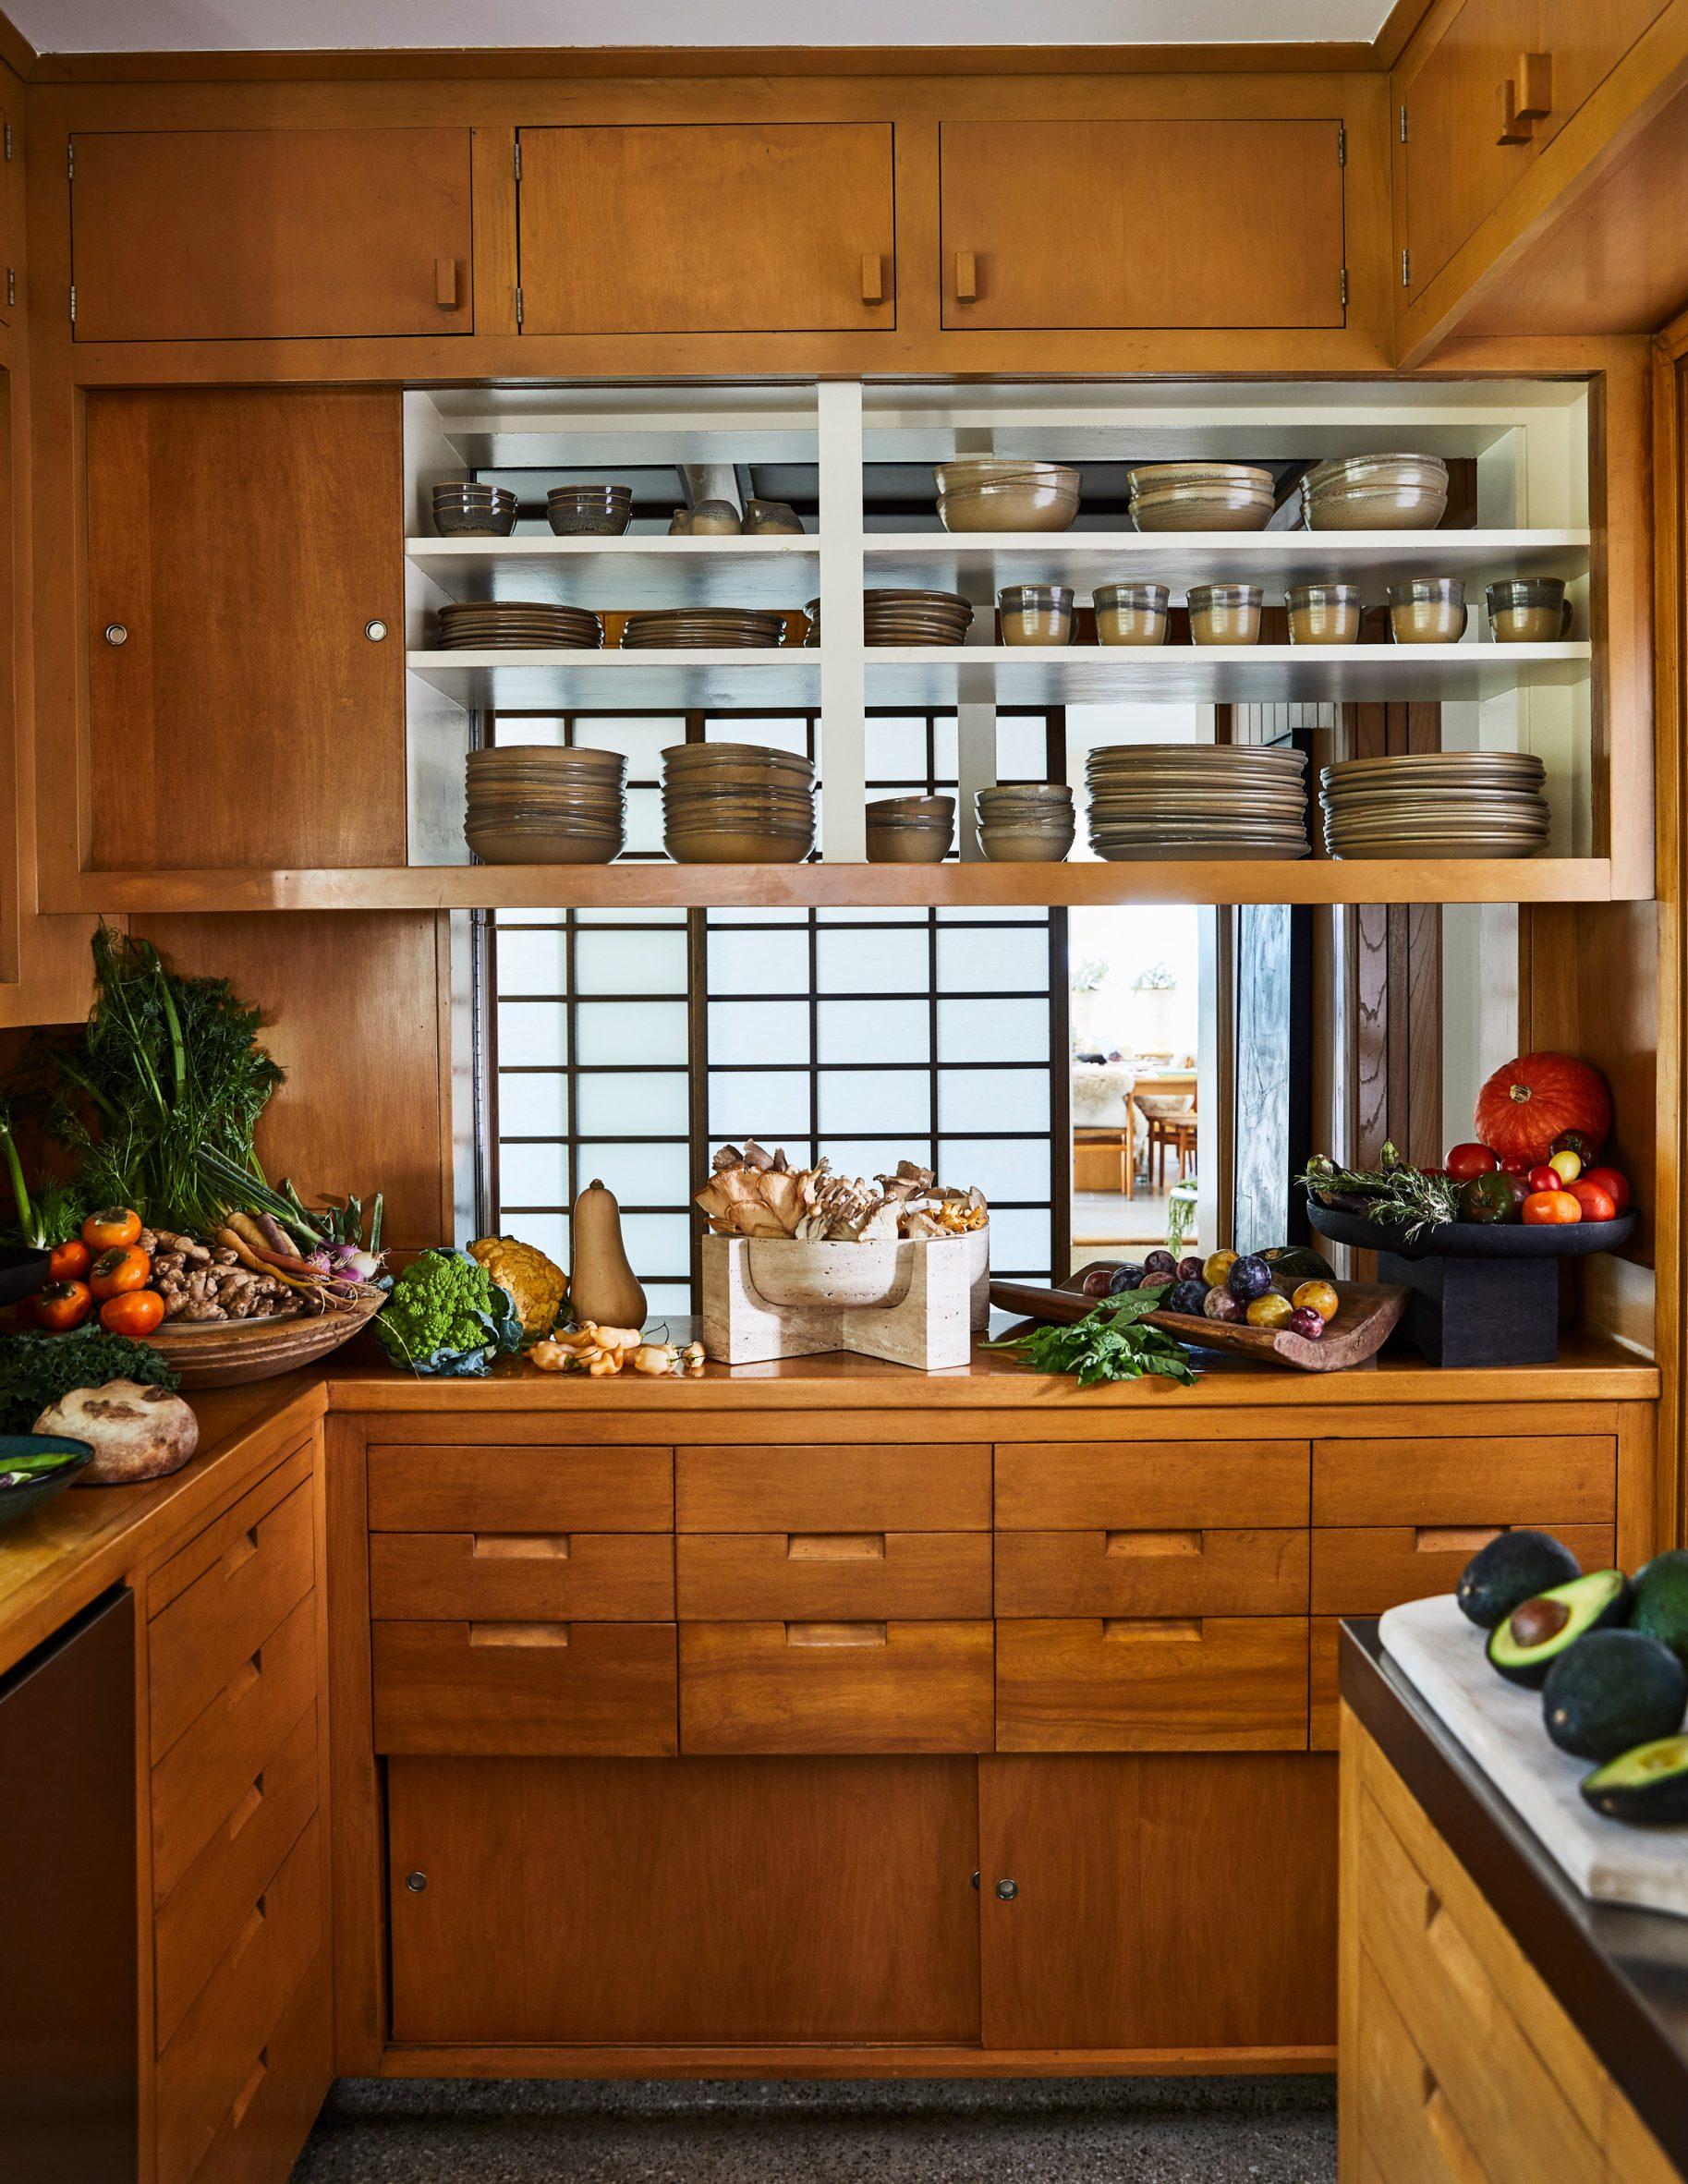 The kitchen of Malibu Surf Shack by Kelly Wearstler